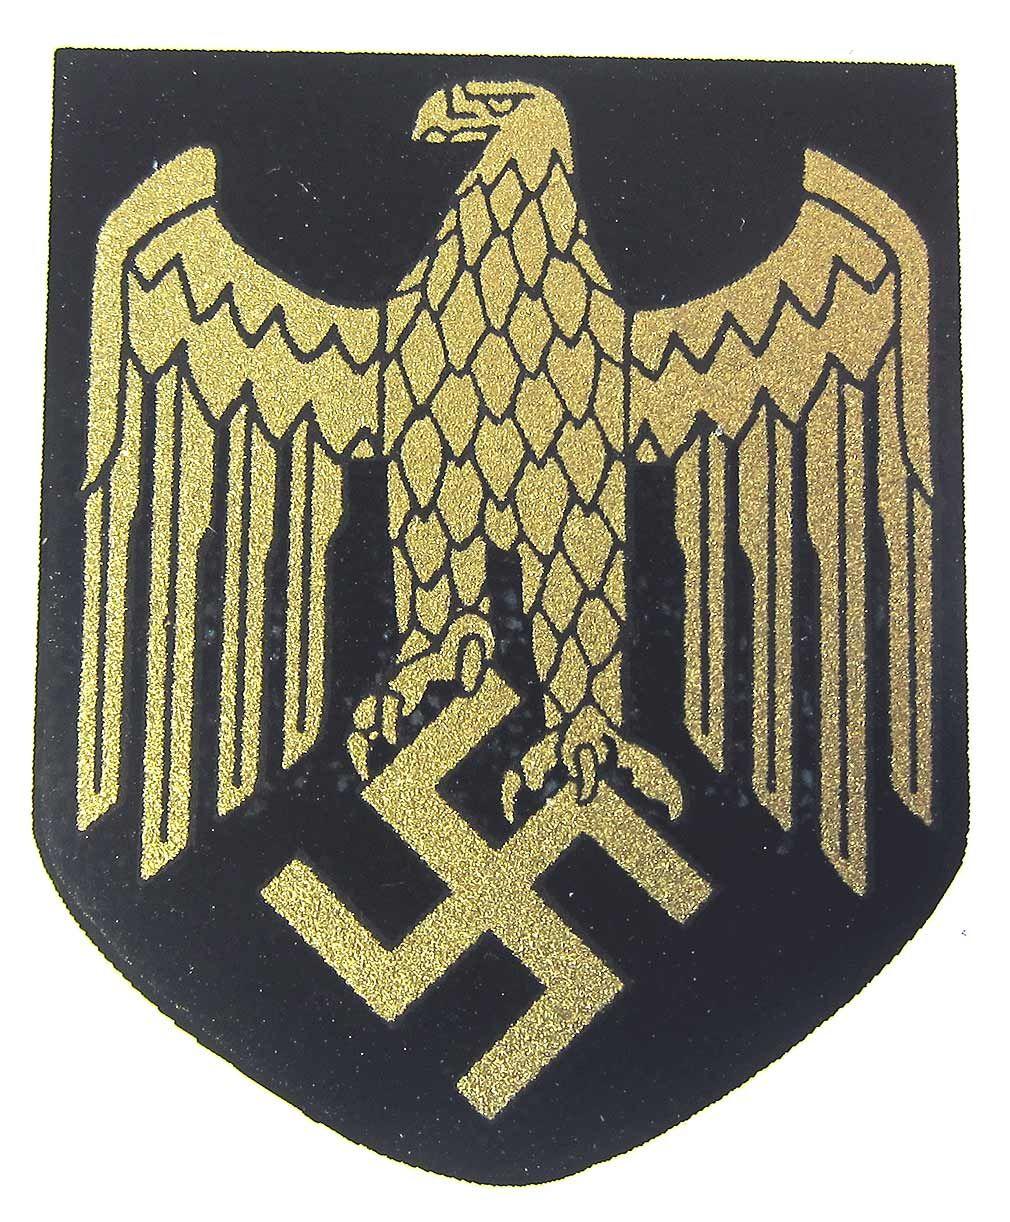 kriegsmarine adler wwii germany kriegsmarine pinterest